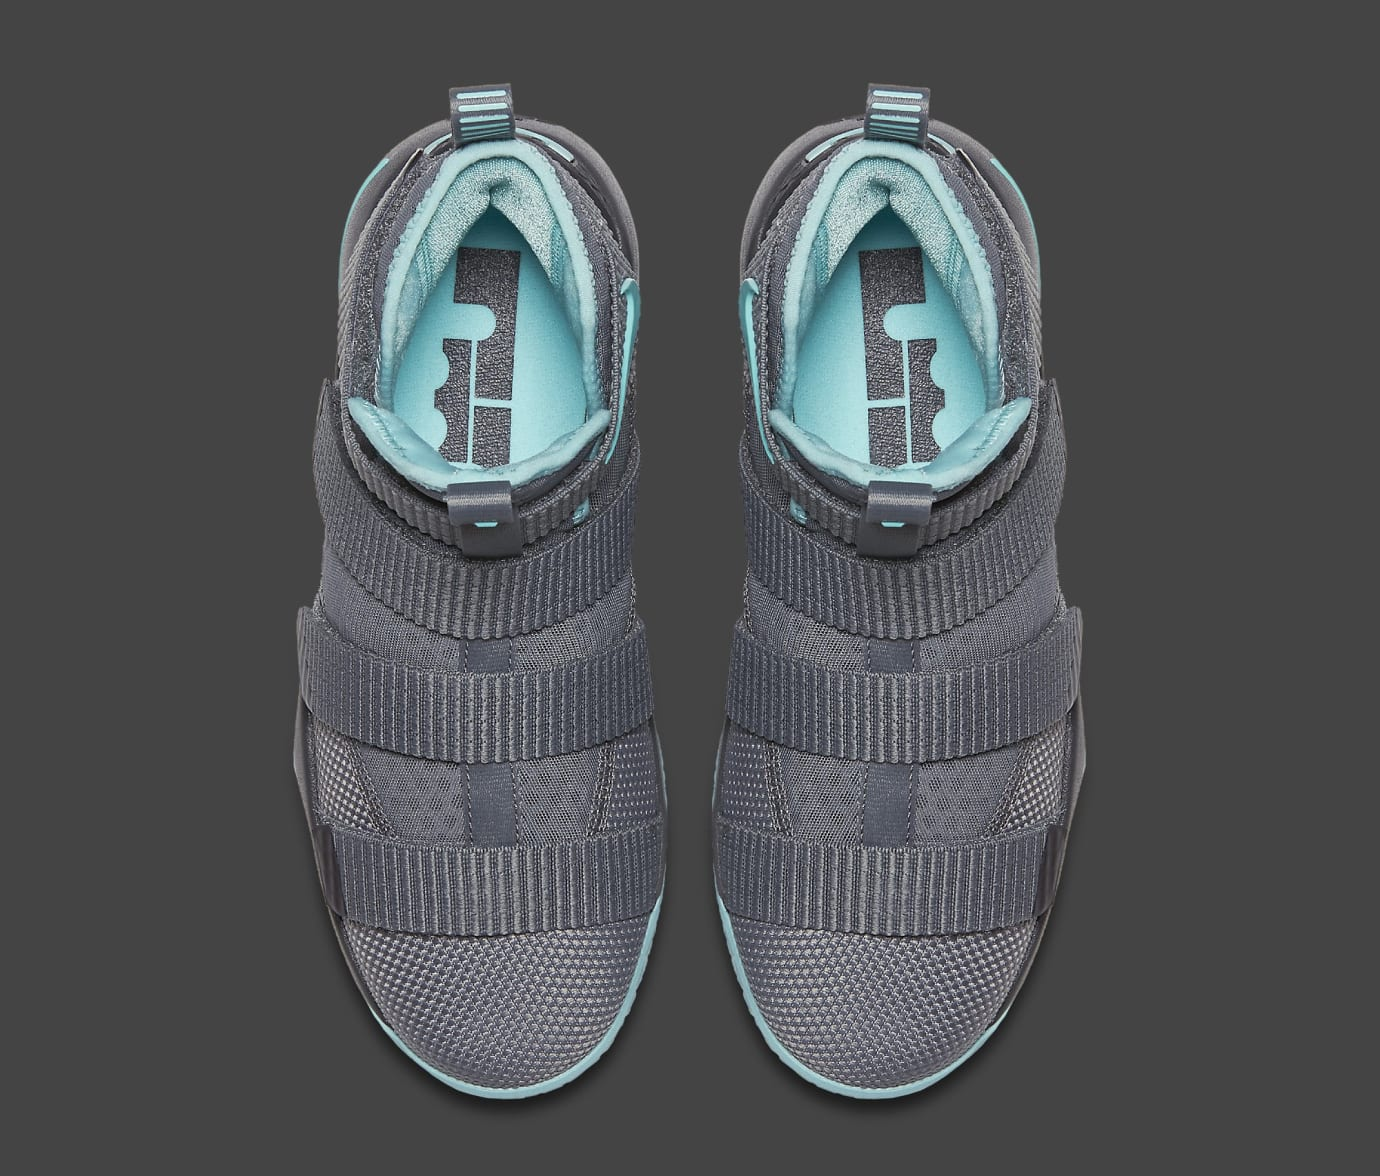 23a7eca0543d Image via Nike Nike LeBron Soldier 11 918369-003